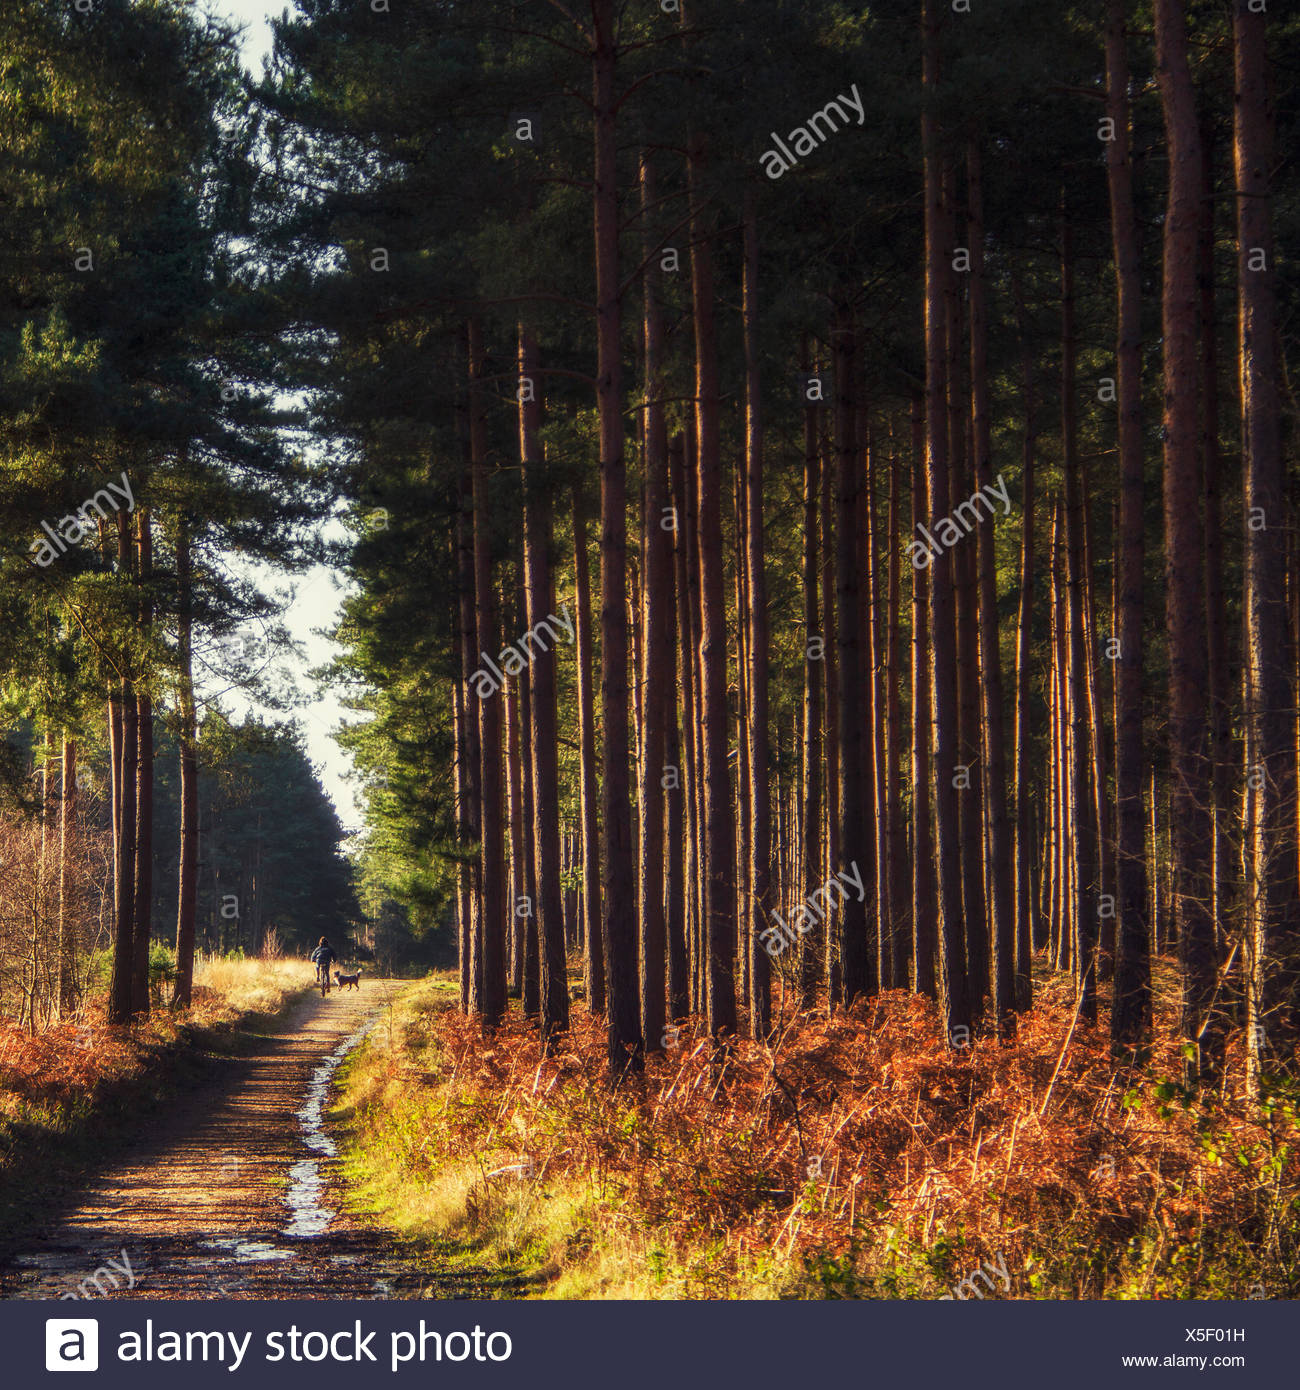 Tall trees along dirt road - Stock Image